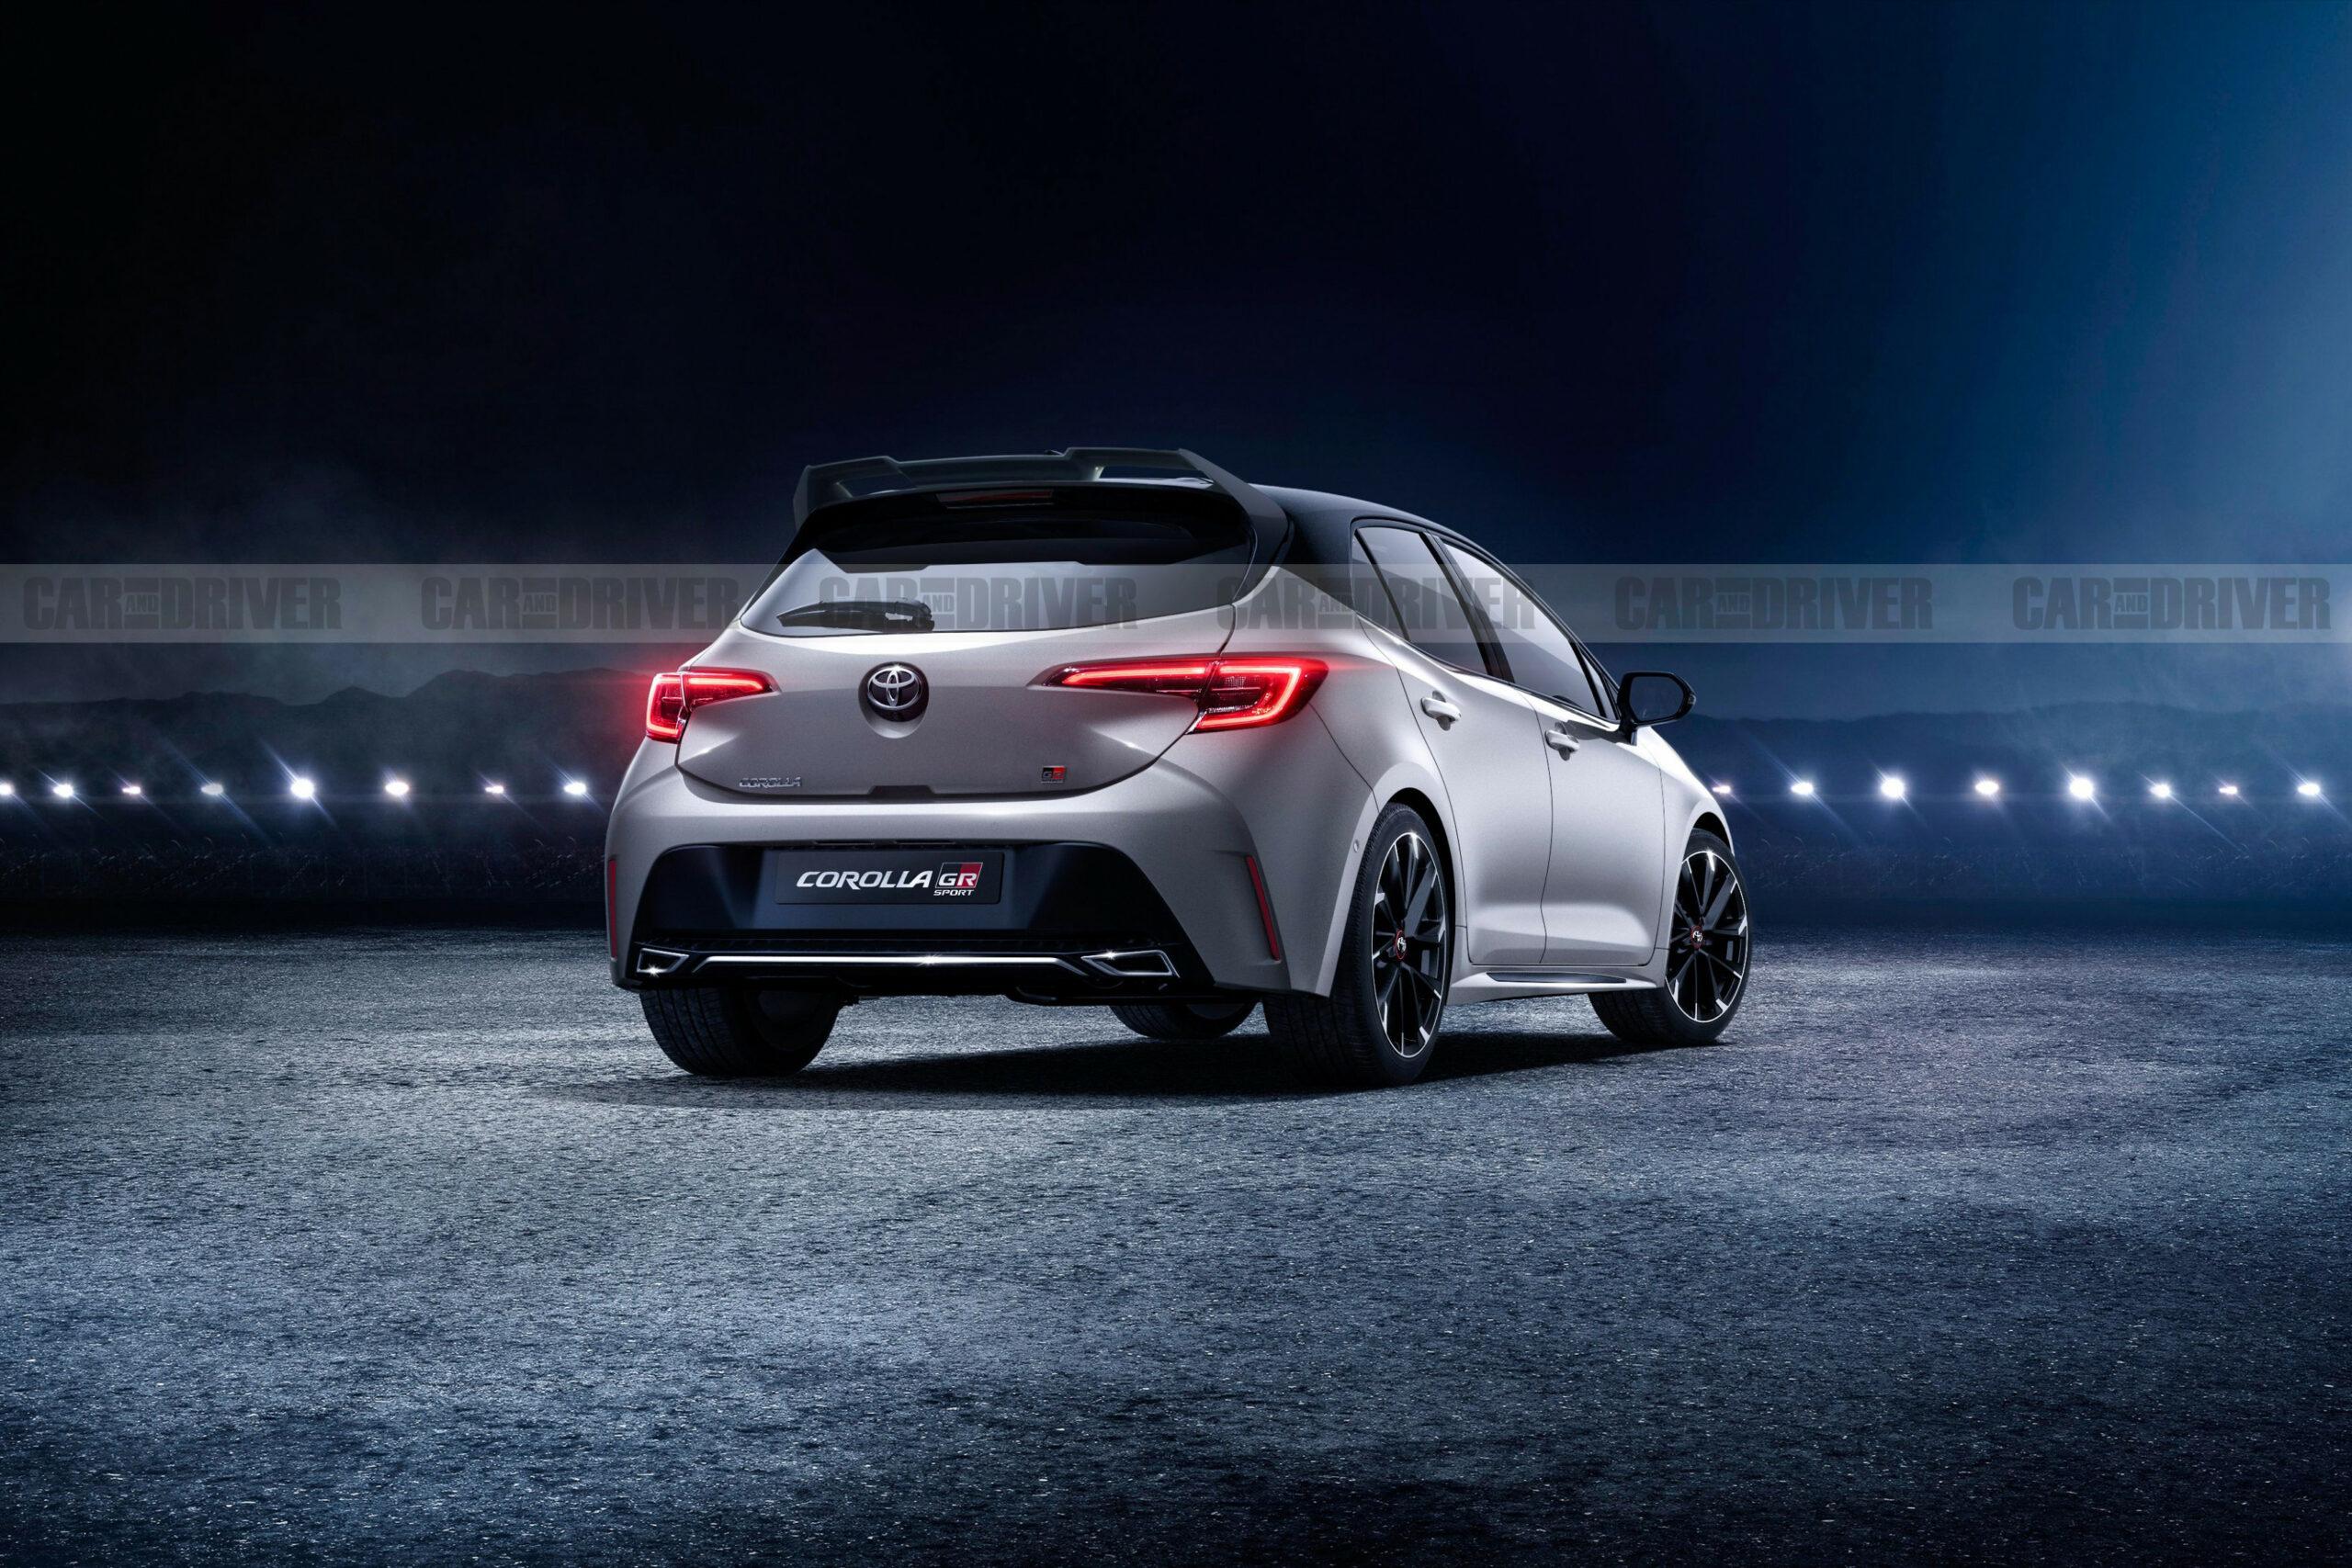 Wallpaper 2022 New Toyota Avensis Spy Shots